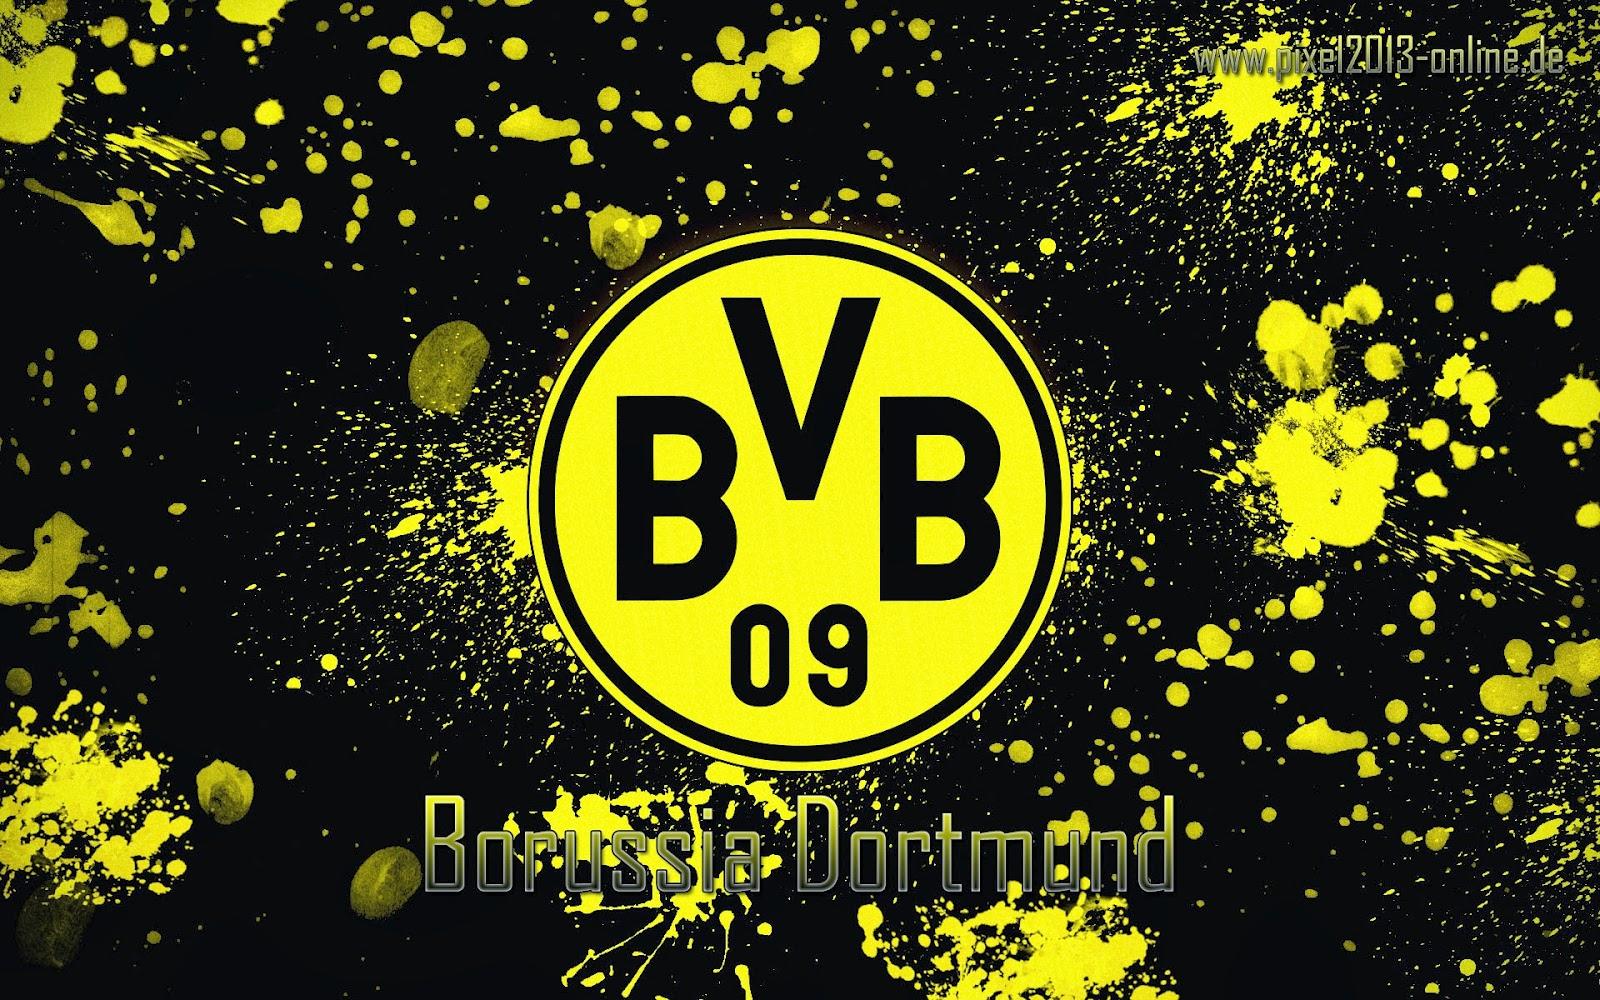 Football Club HD Wallpapers